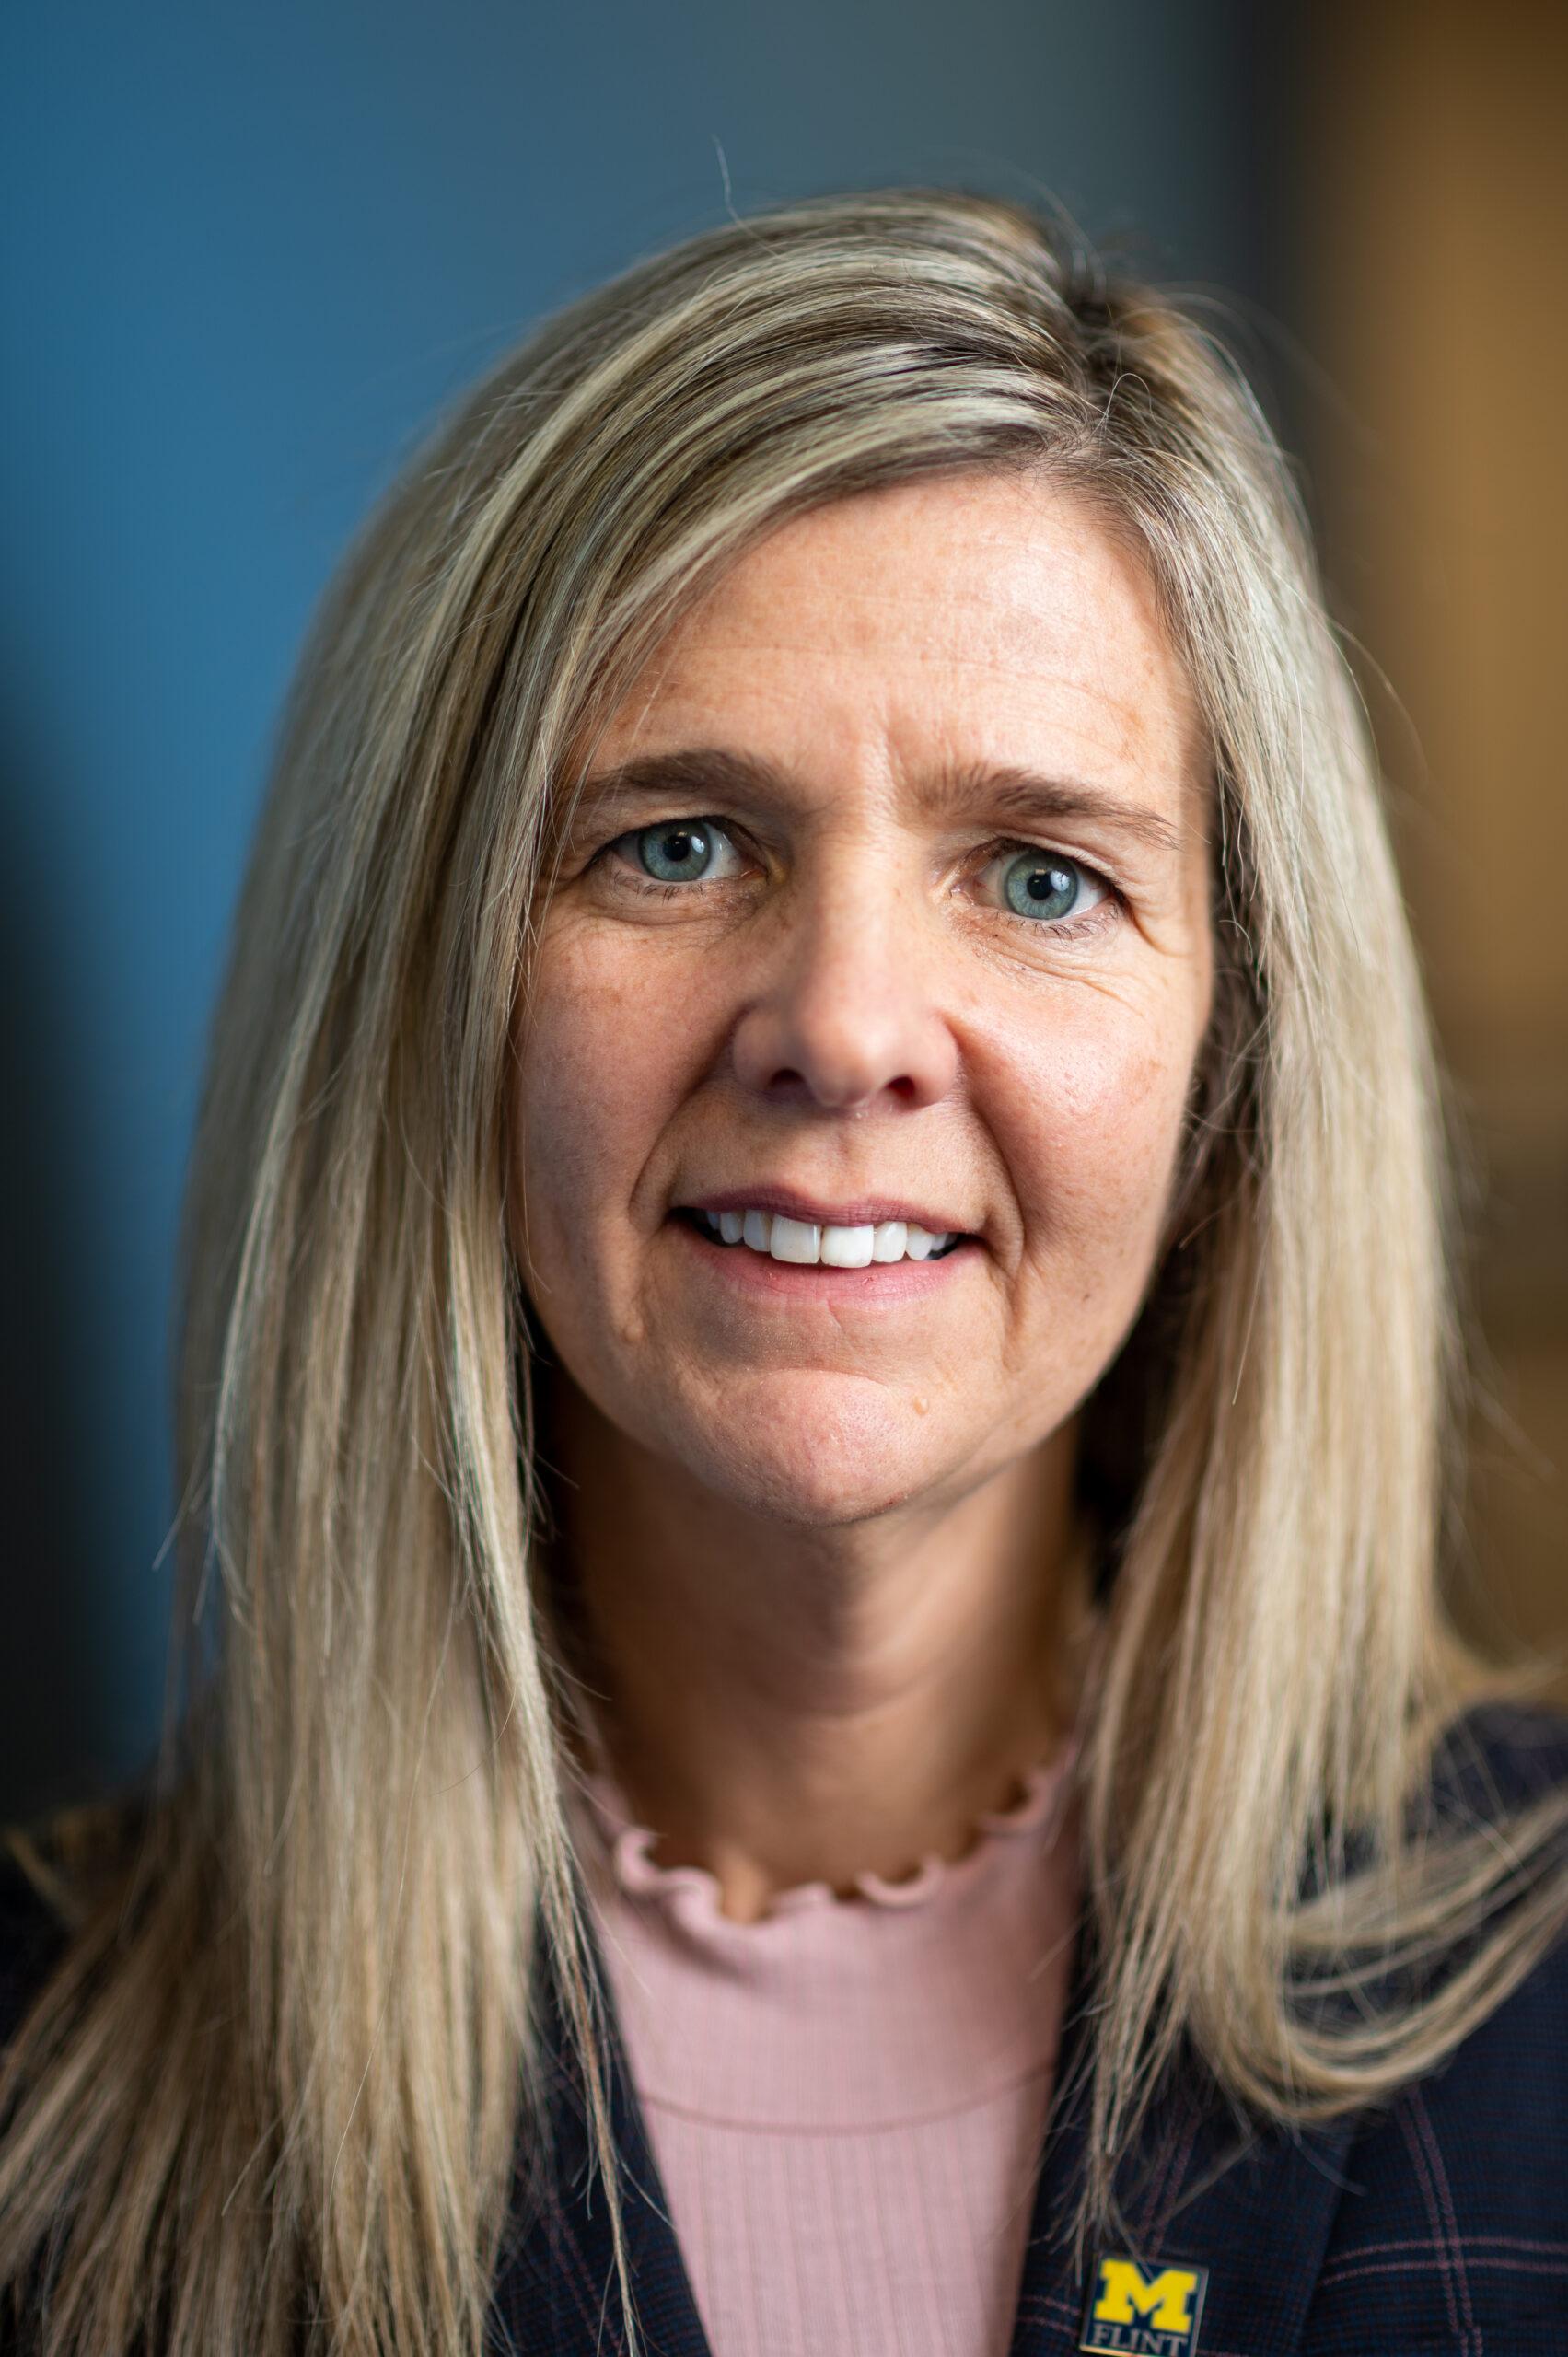 Paula Nas, Director, Office of Economic Development, UM-Flint. Image credit: Eric Bronson / Michigan Photography